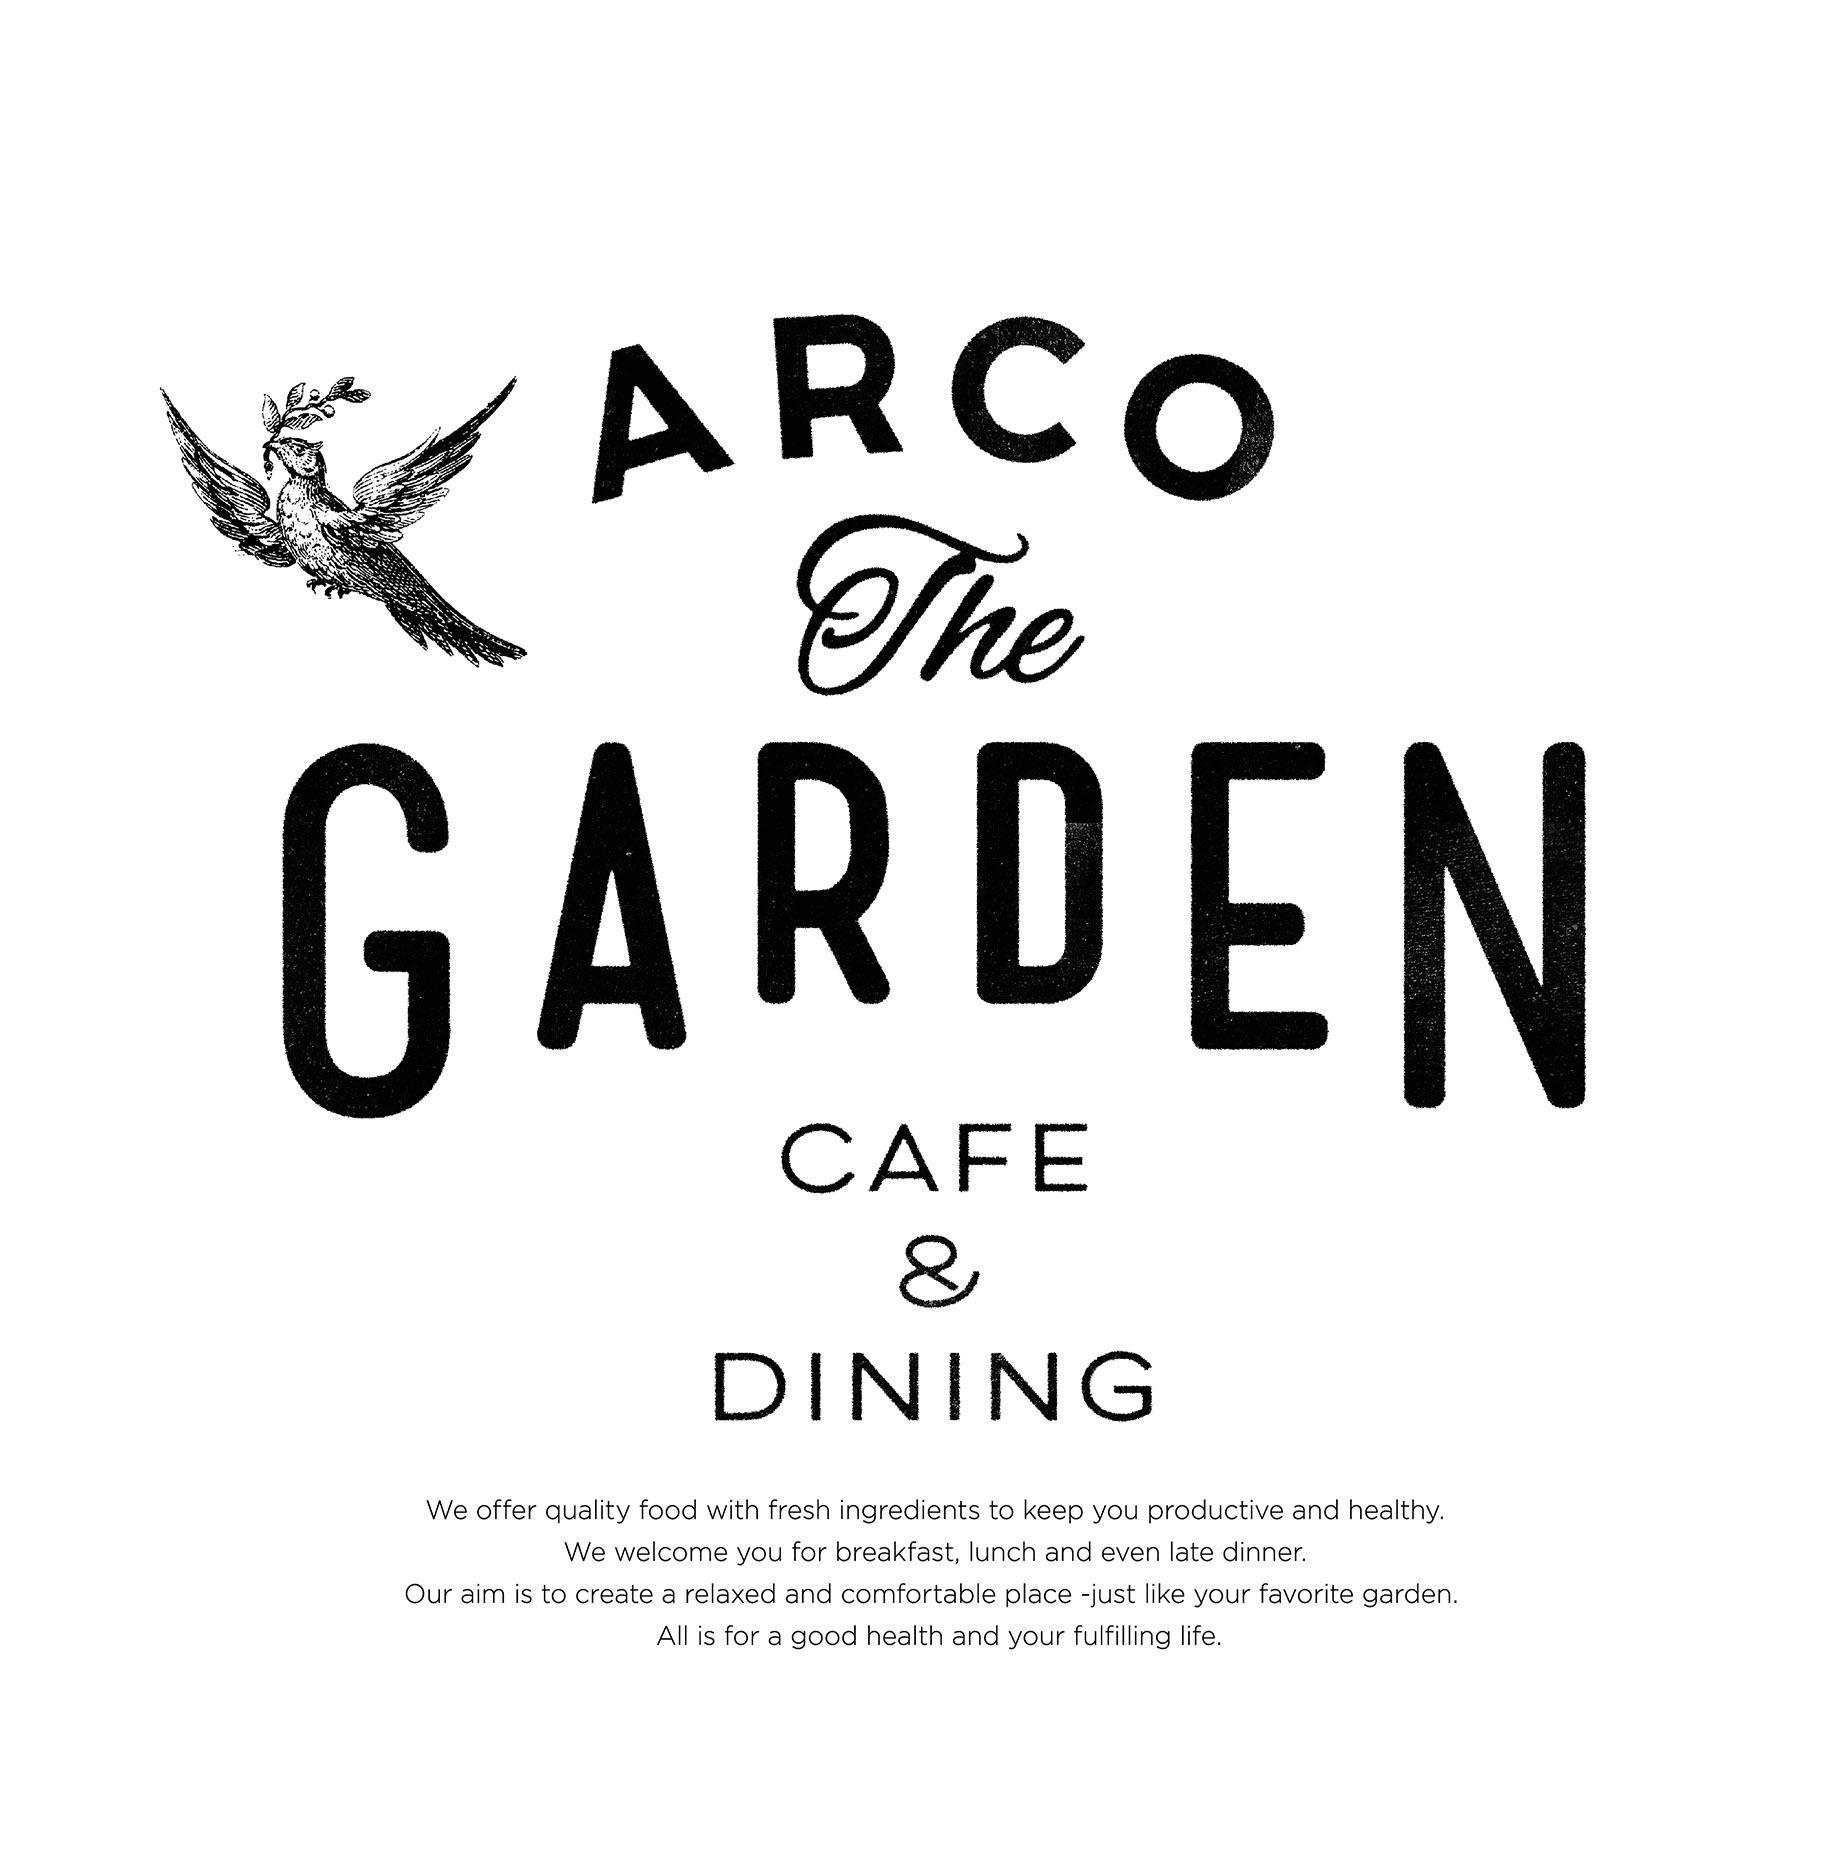 Arco The Garden 上田崇史 Typo Logo Lettering Logo Inspiration